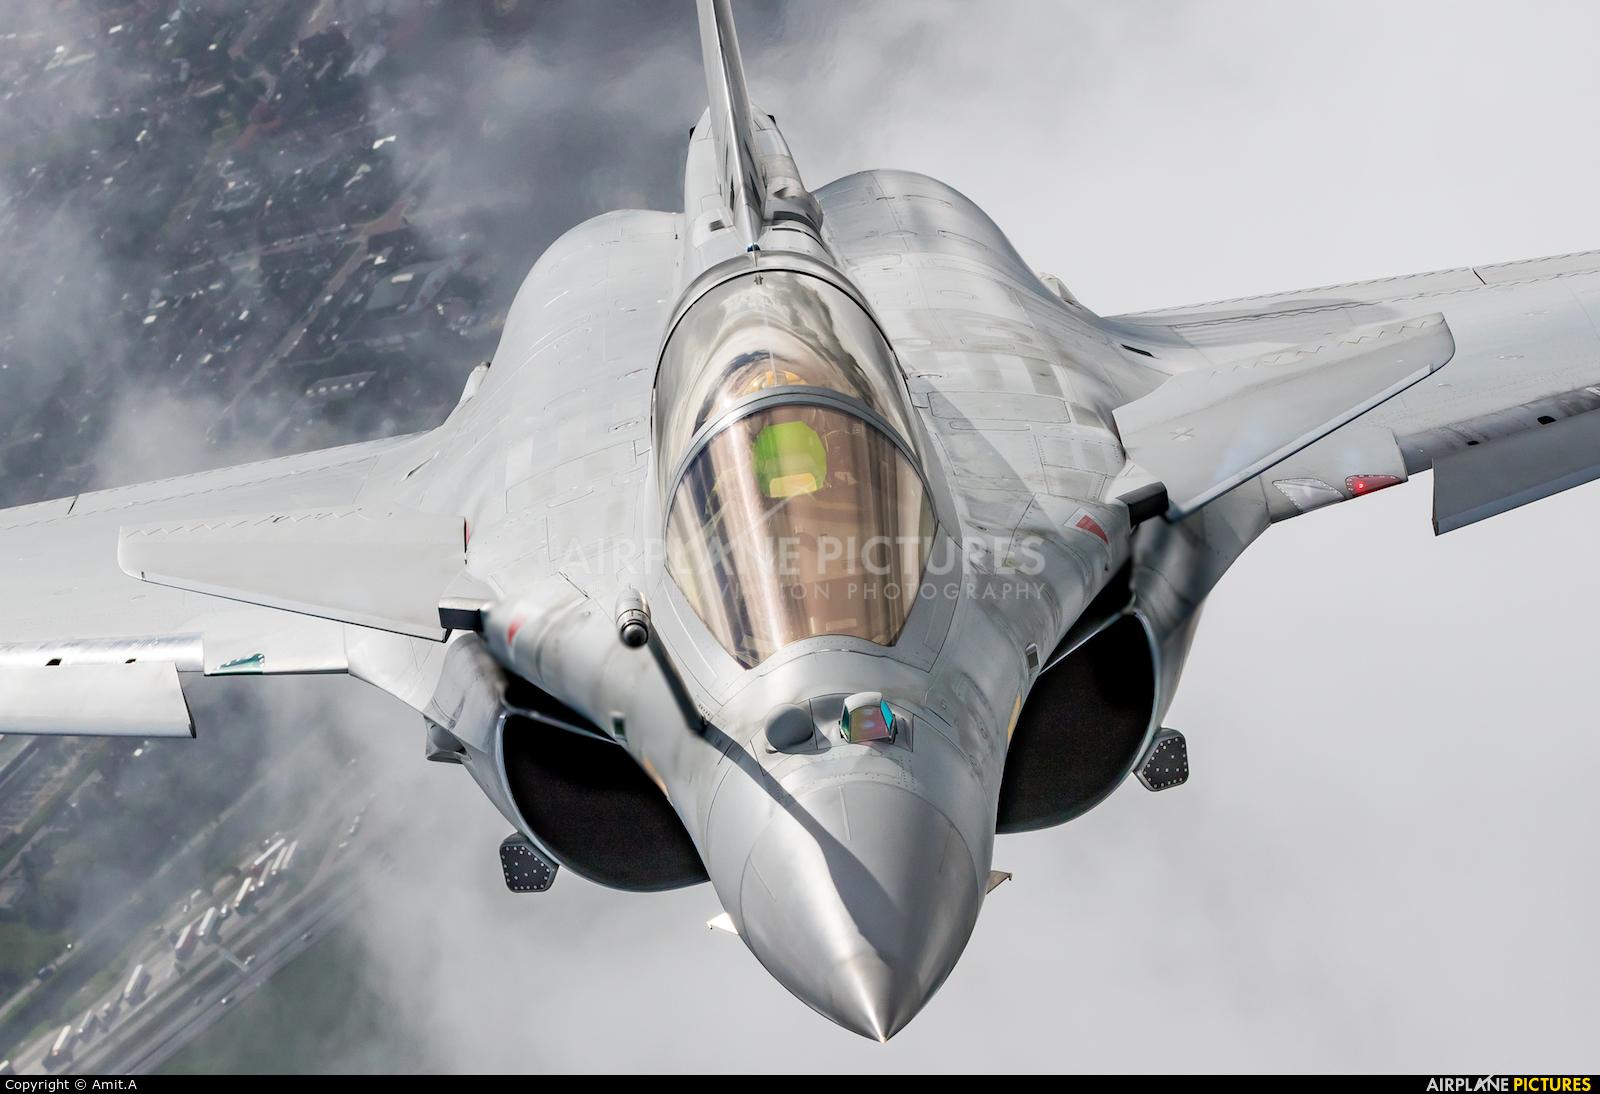 France - Air Force 317 aircraft at In Flight - Belgium